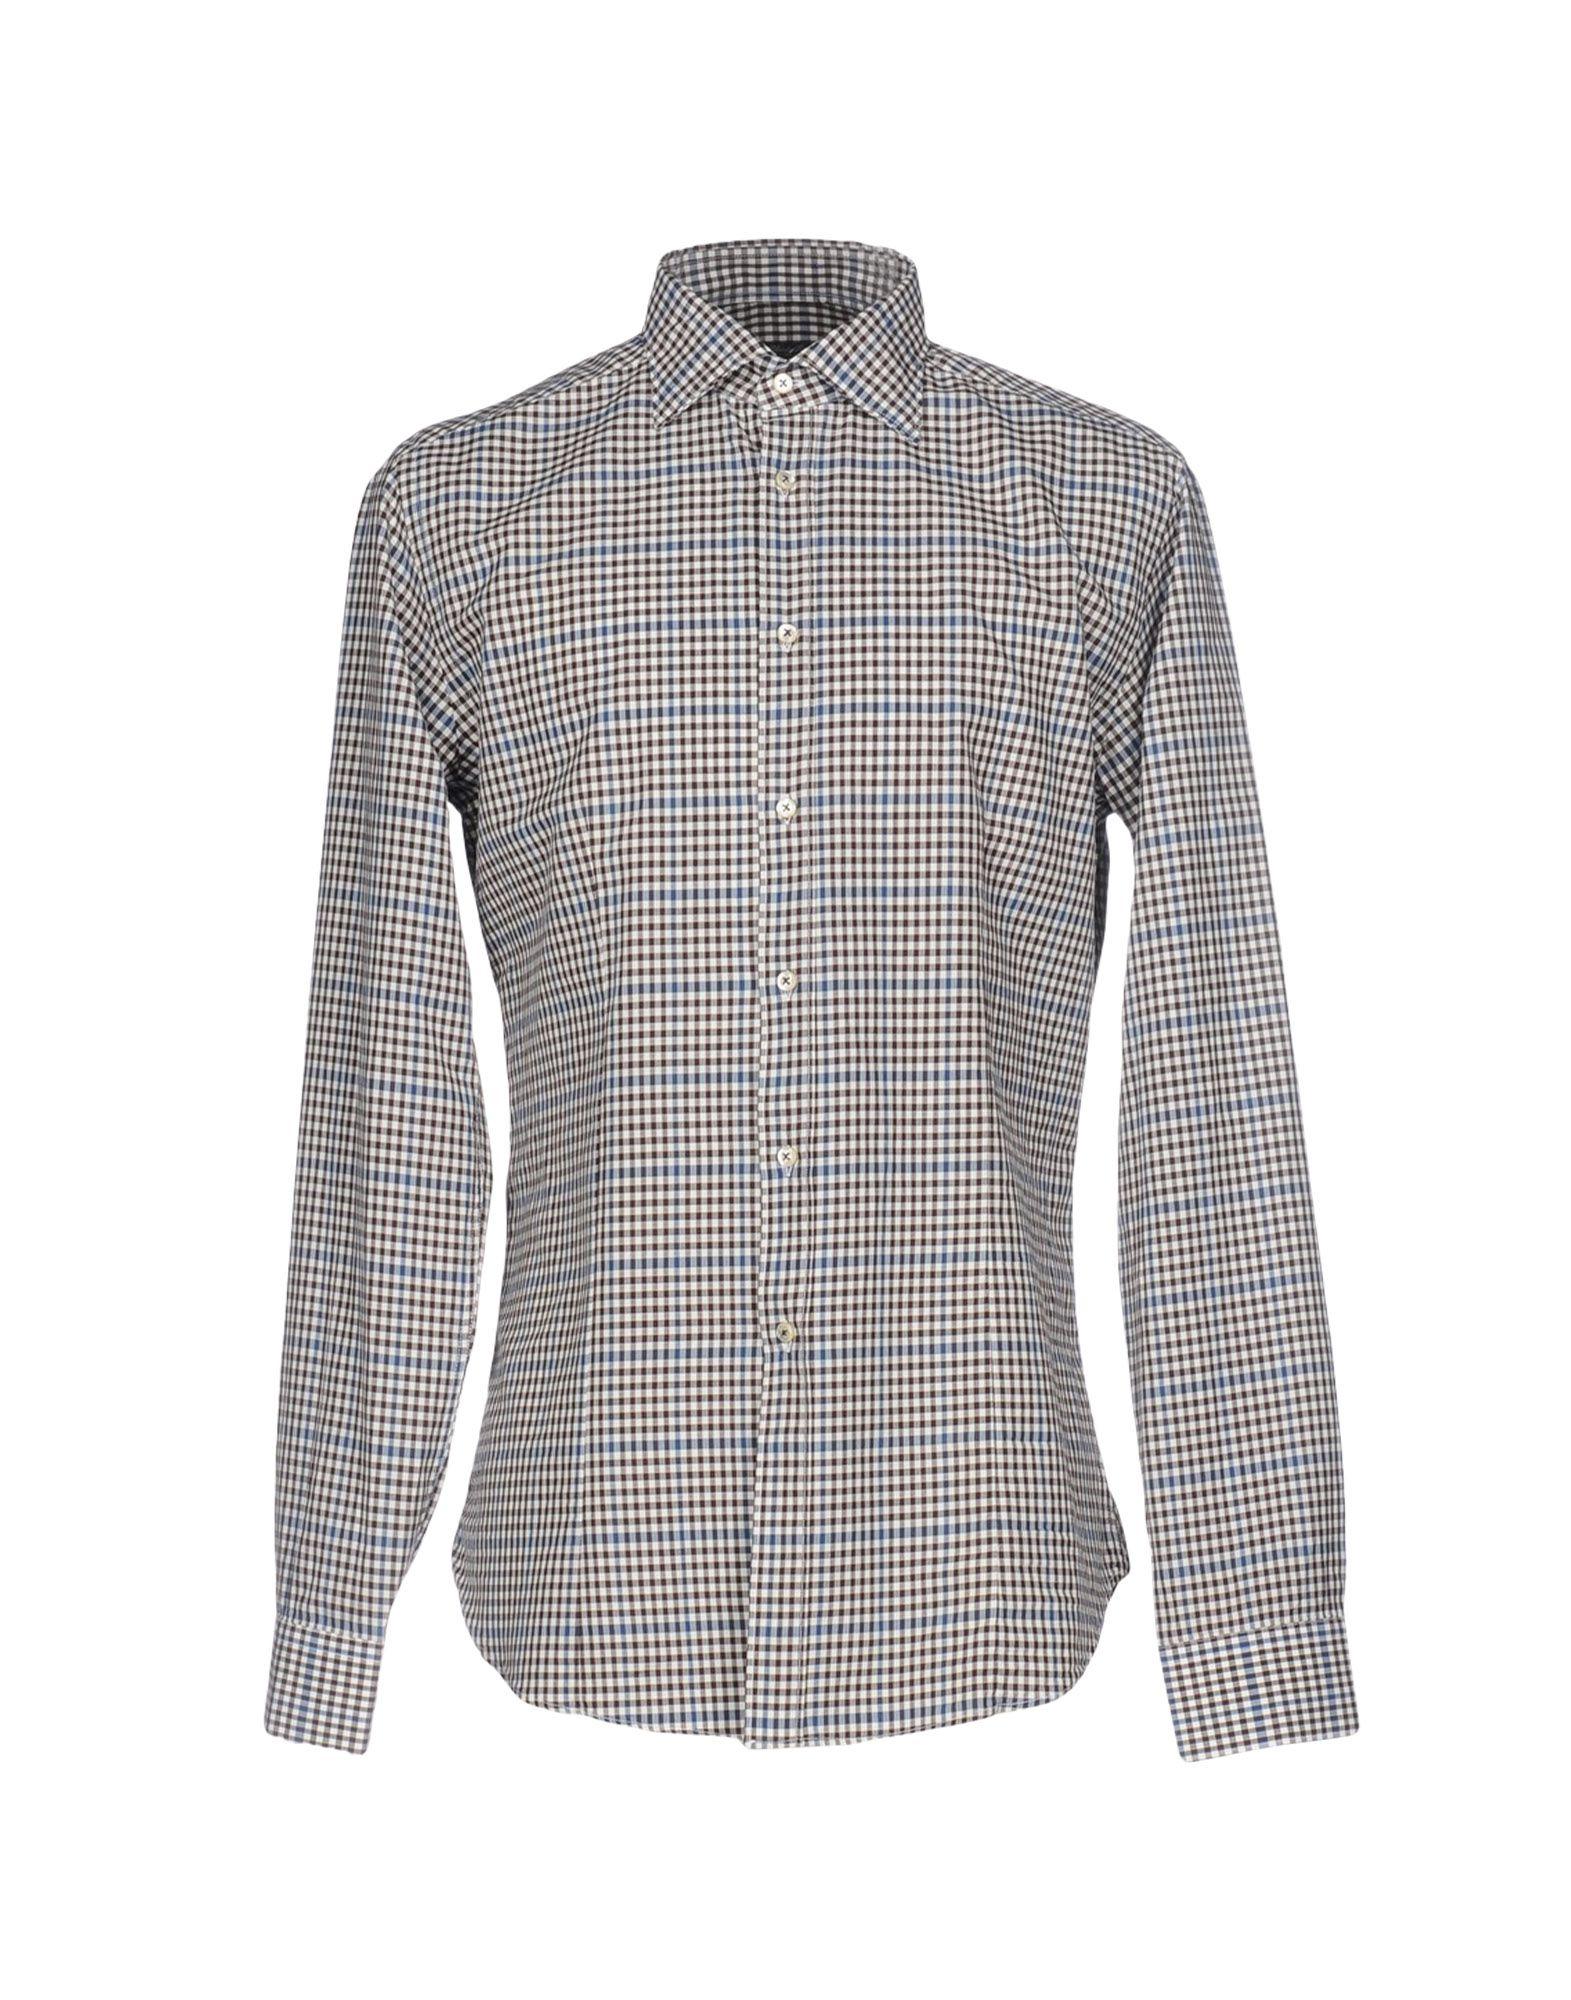 LIBERTY ROSE Pубашка рубашка в клетку insight liberty pit blue